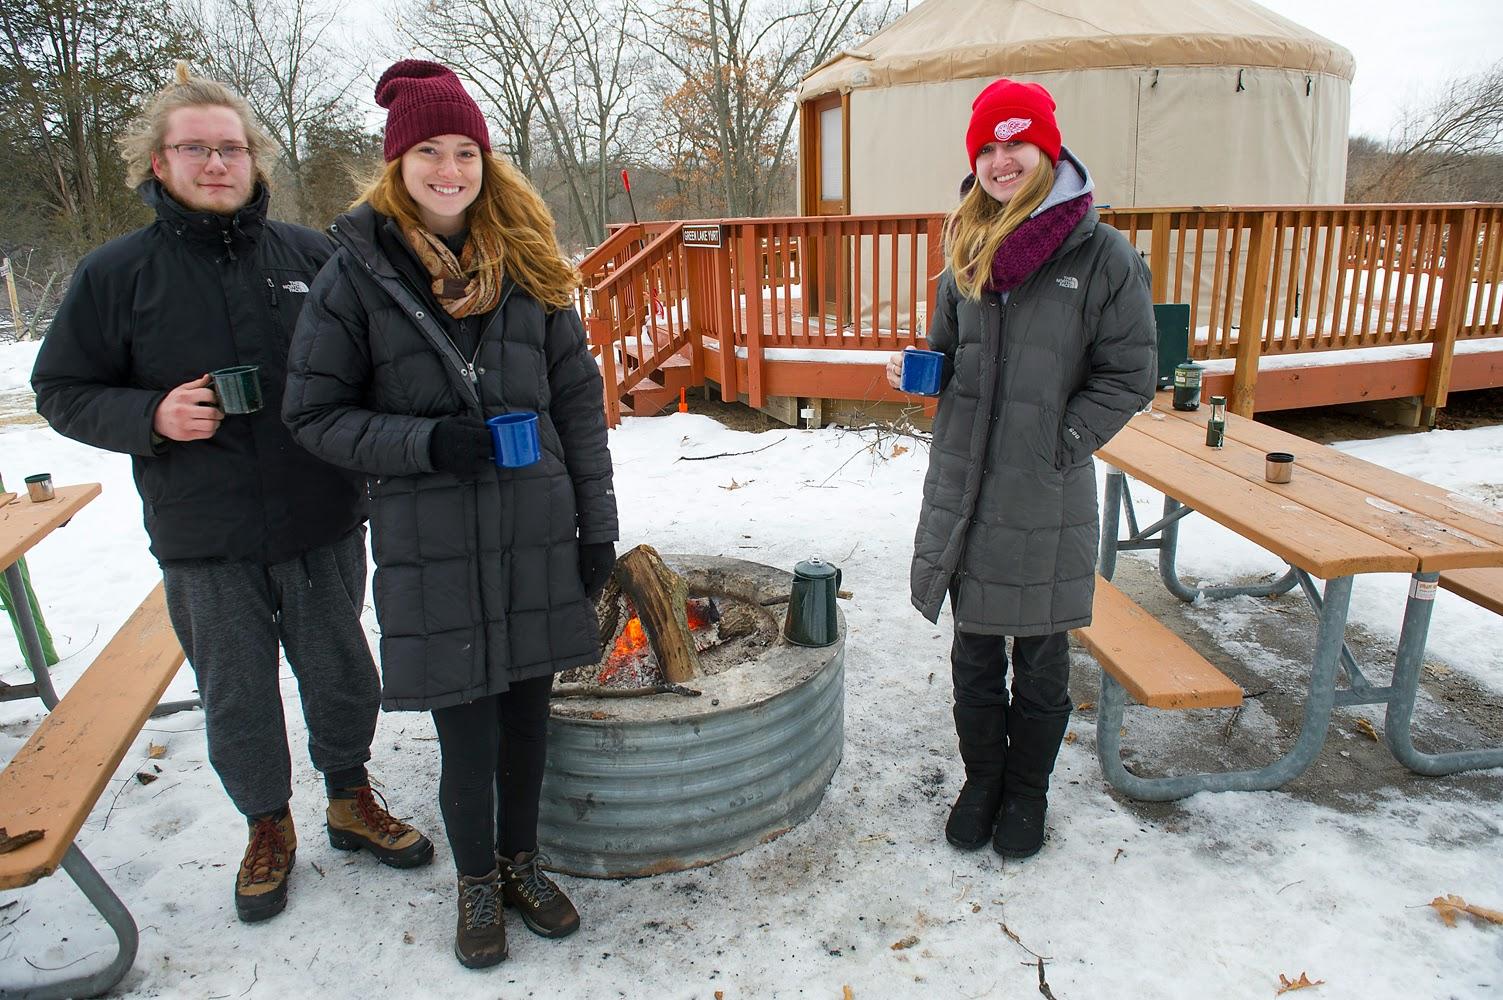 Showcasing the Michigan DNR: Winter Camping Alternative ...